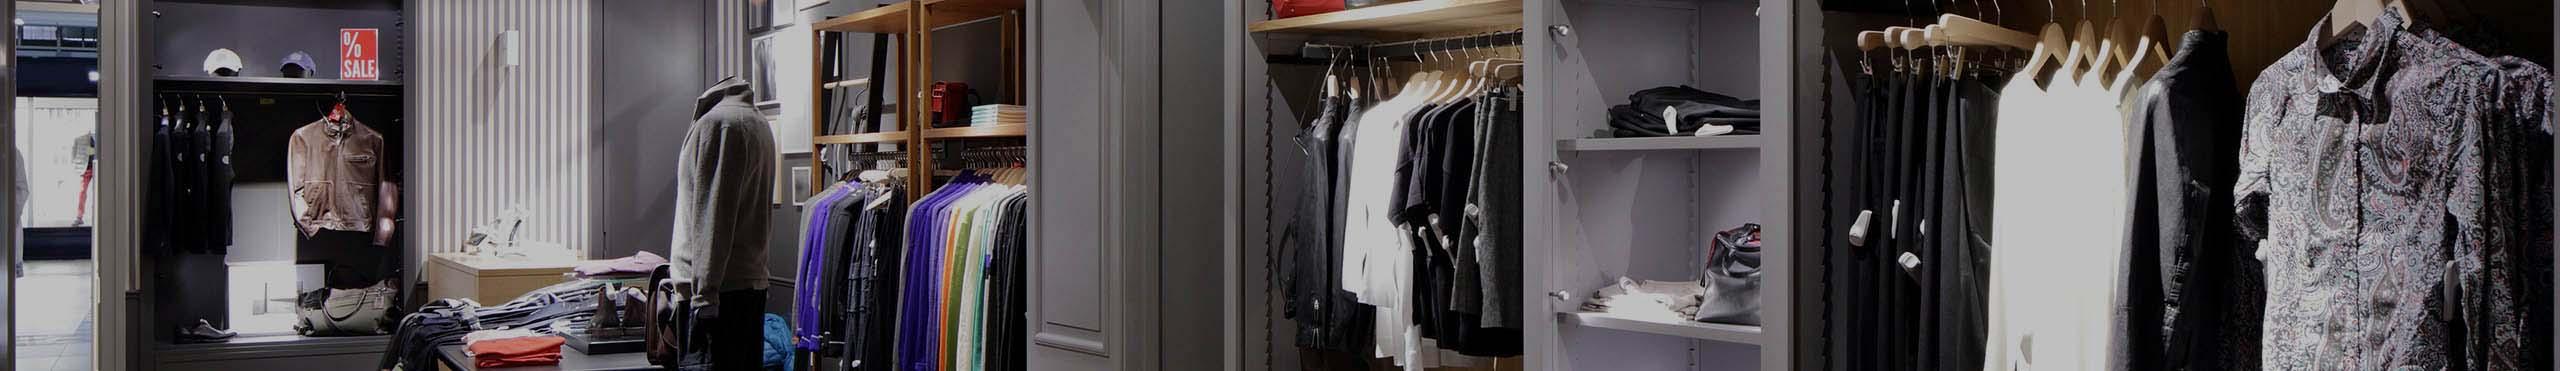 LVMH : un choix de luxe